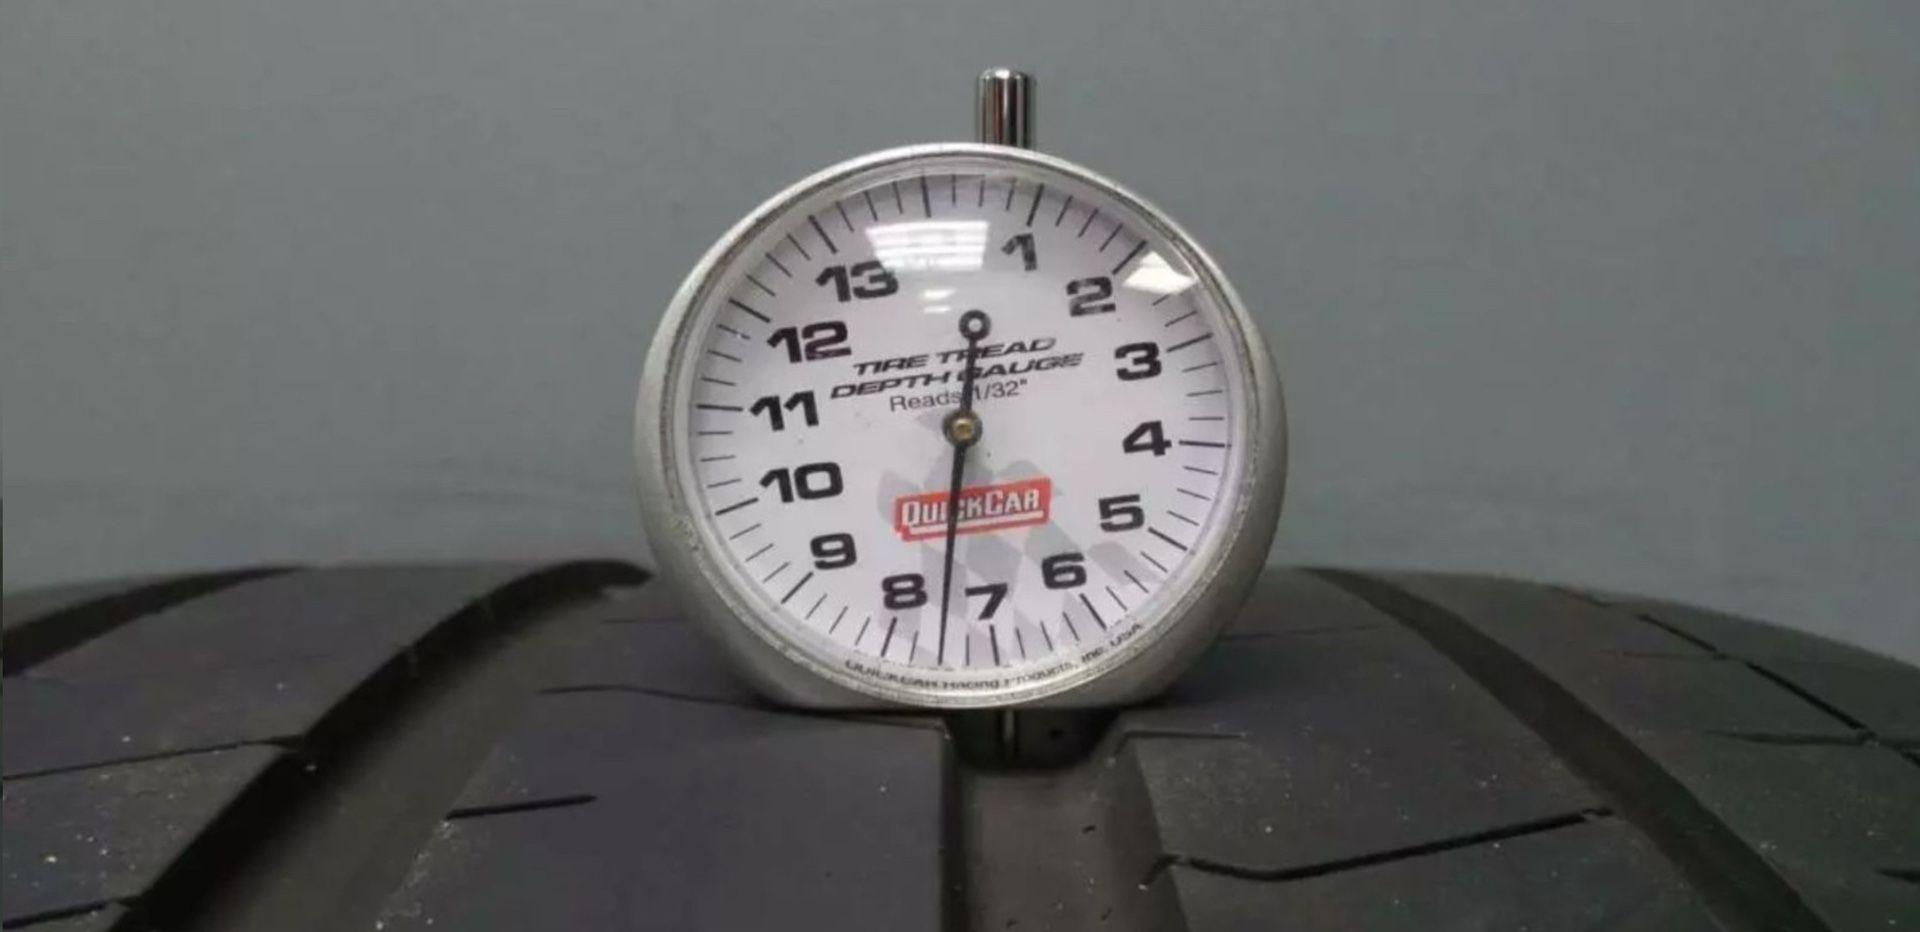 Pair 315 35 21 Pirelli PZERO Run Flat with 75% Tread 6/32 111Y #7620